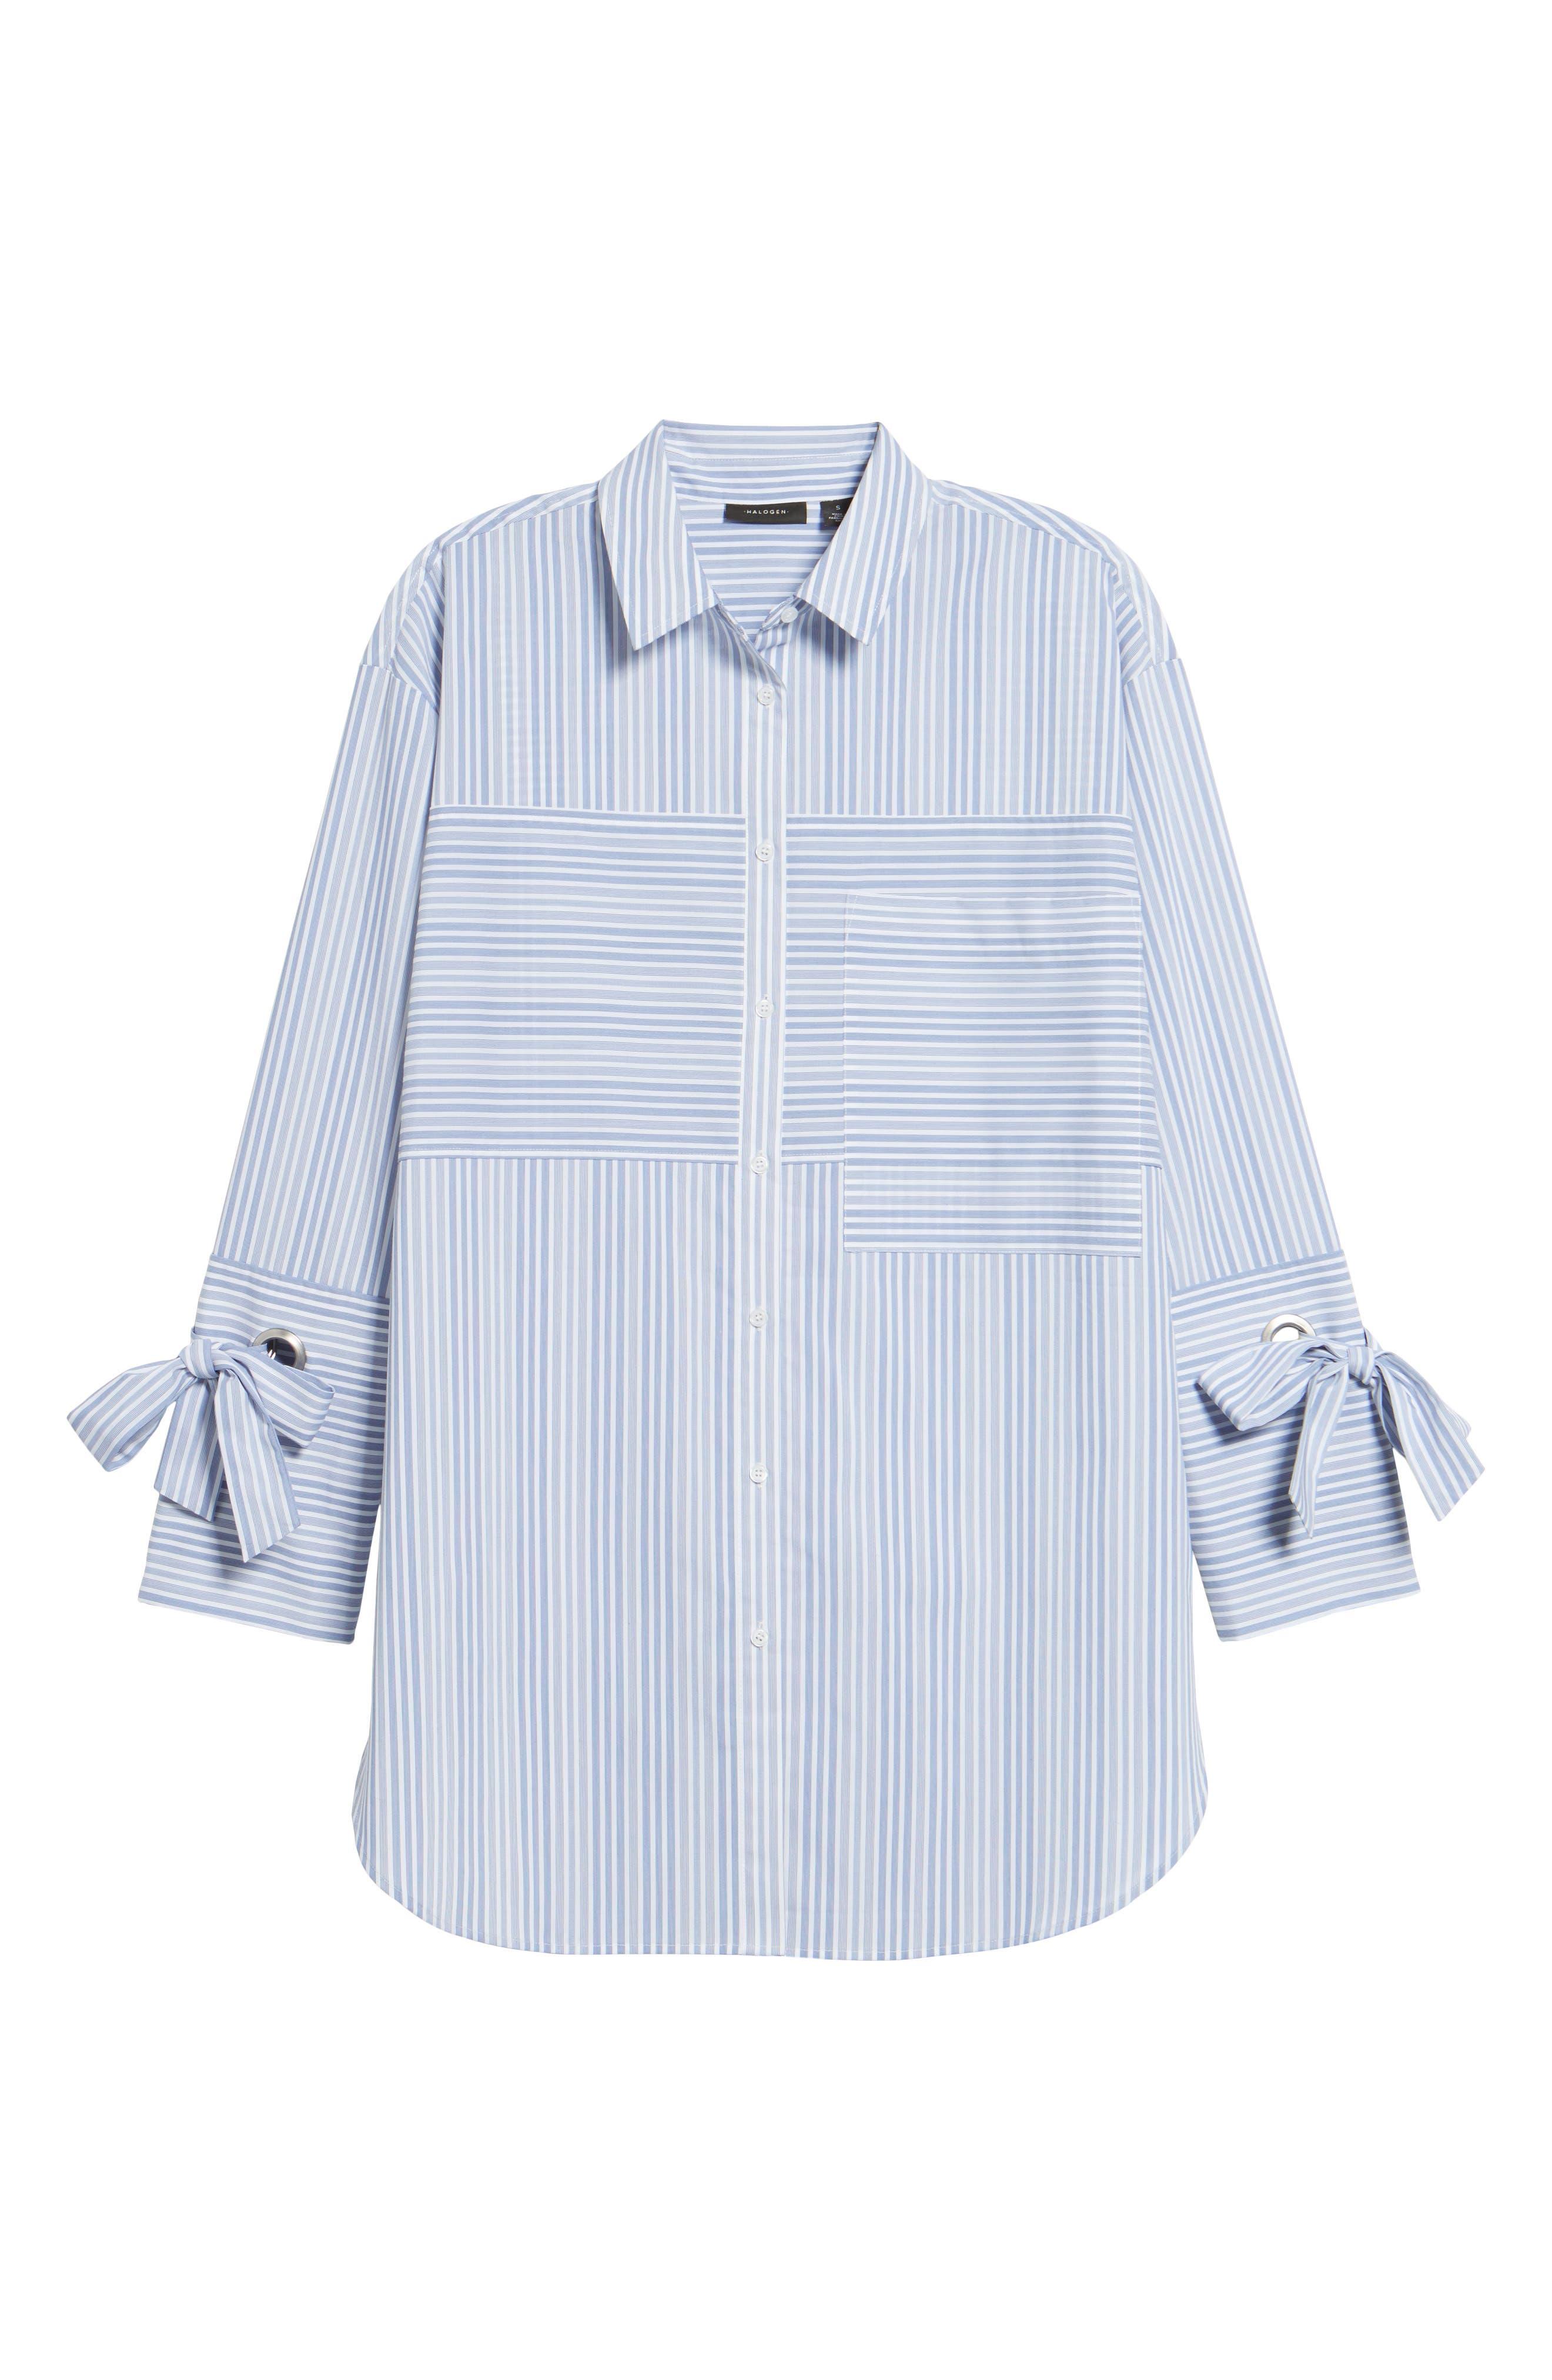 Pocket Detail Stripe Tunic Top,                             Alternate thumbnail 6, color,                             Blue- White Stripe